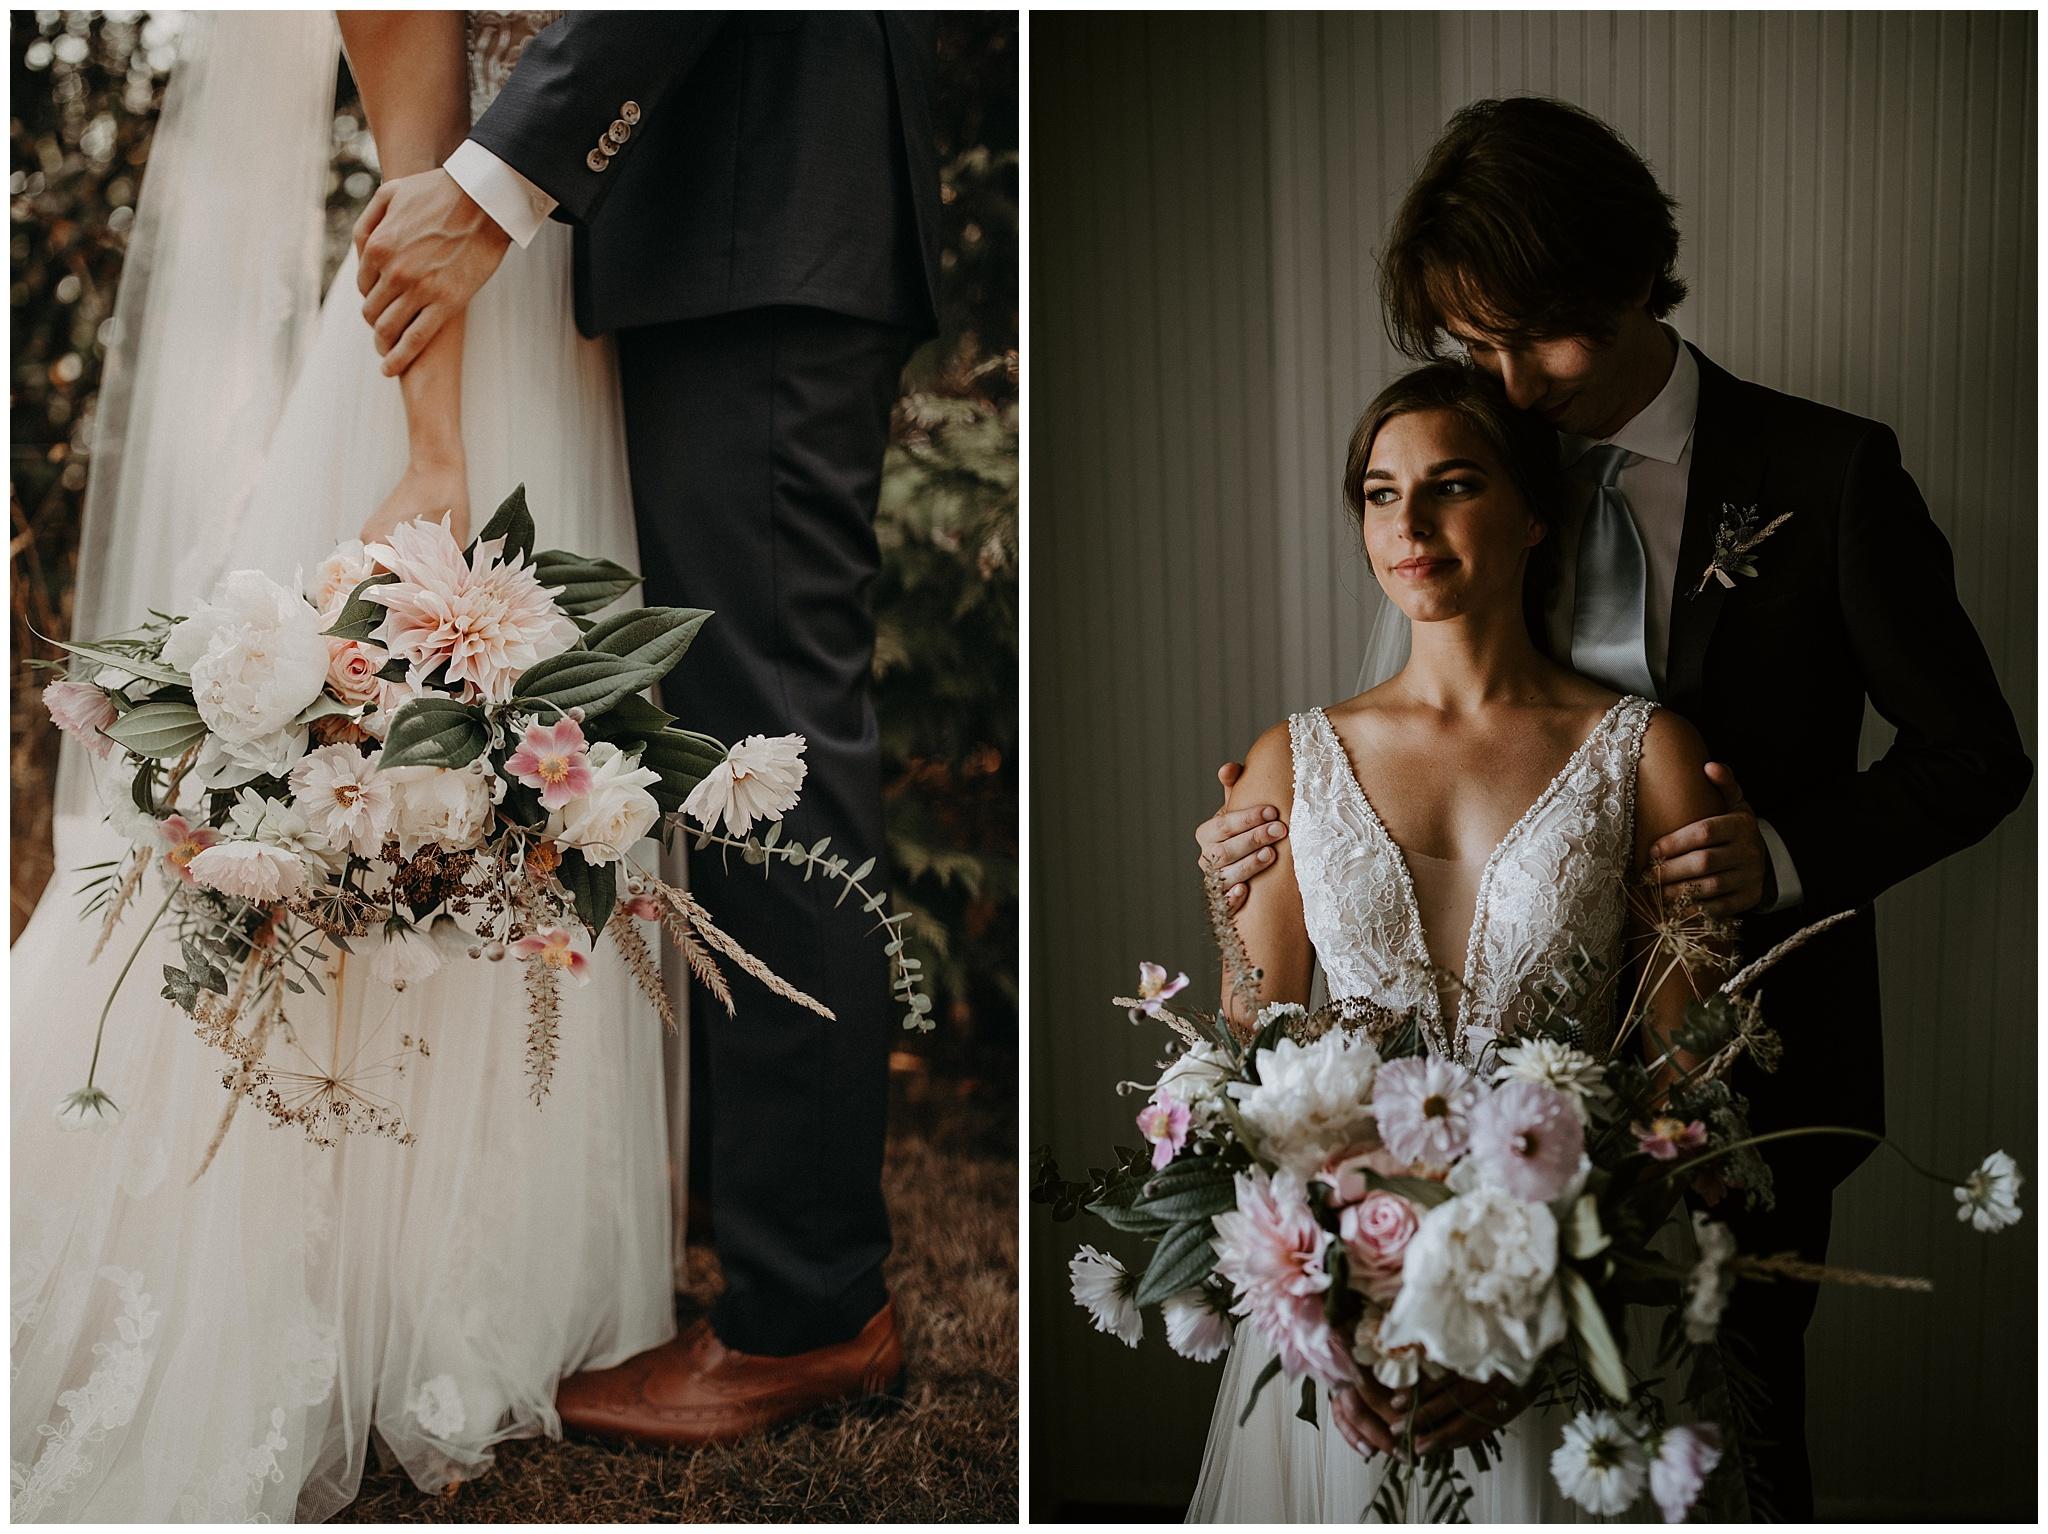 estate-248-wedding-langley-023.JPG